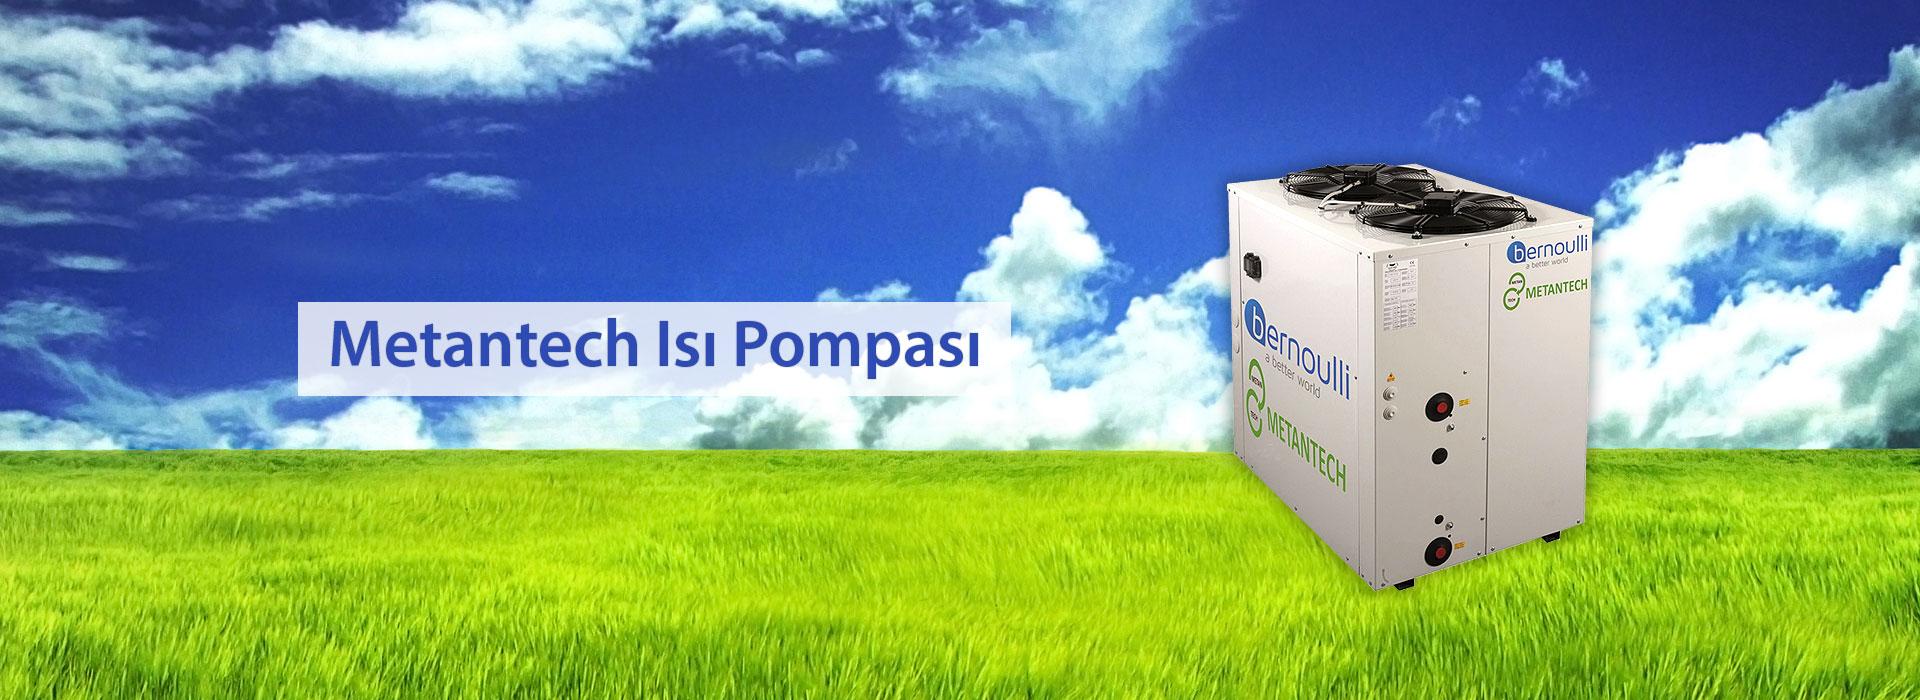 banner-2-metantech-isi-pompasi(1)